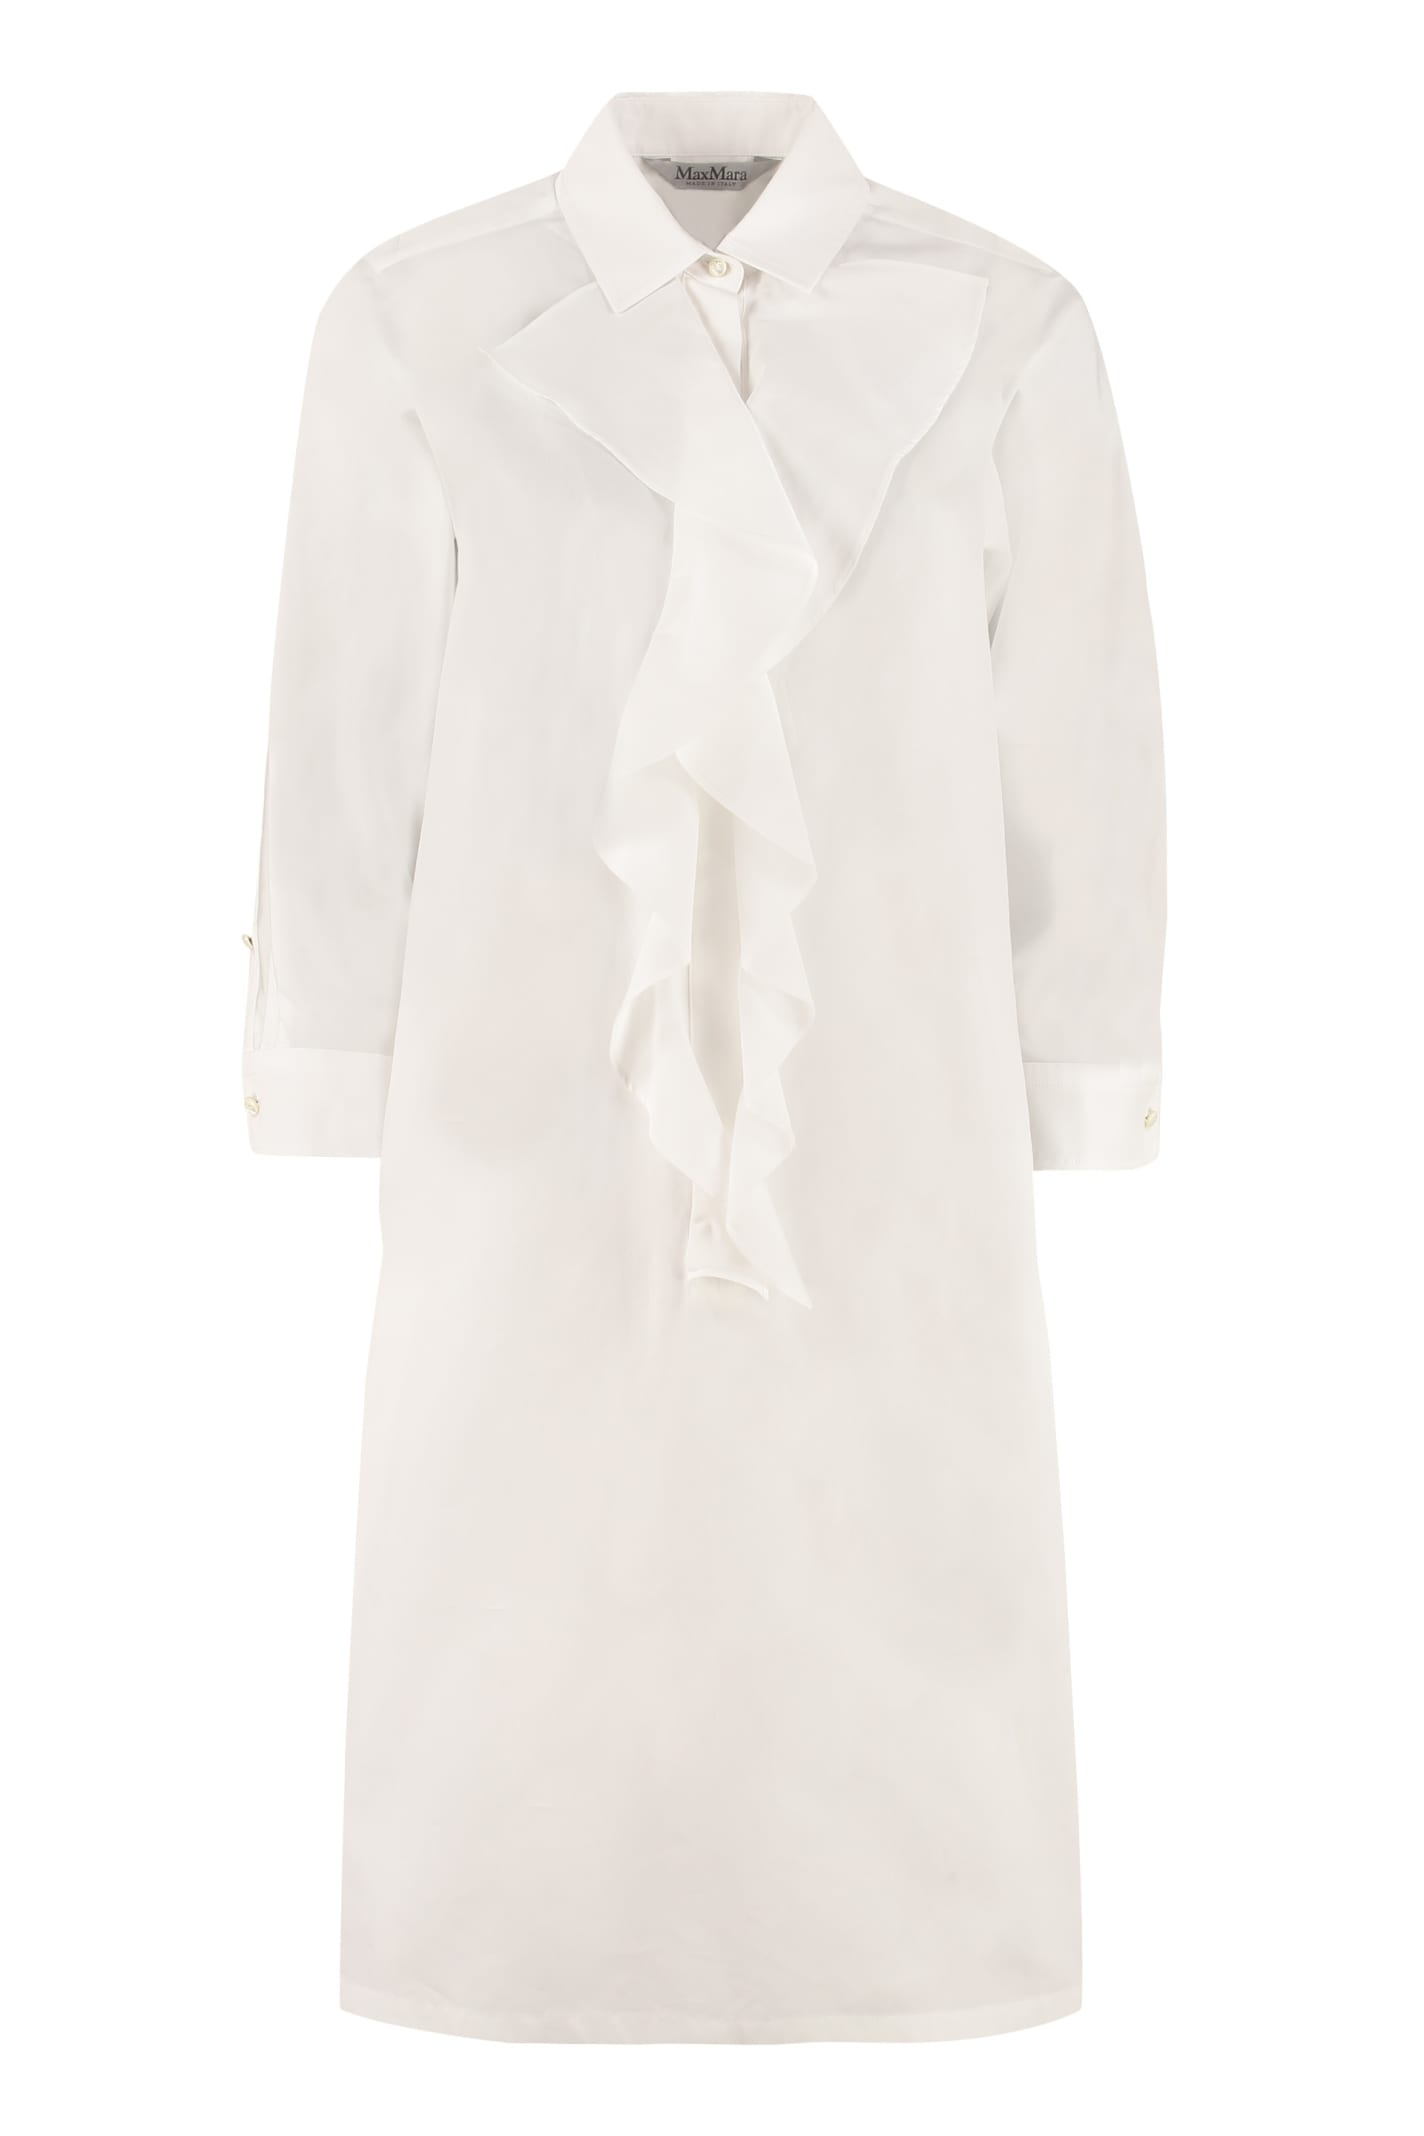 Buy Max Mara Cotton Shirt Dress online, shop Max Mara with free shipping